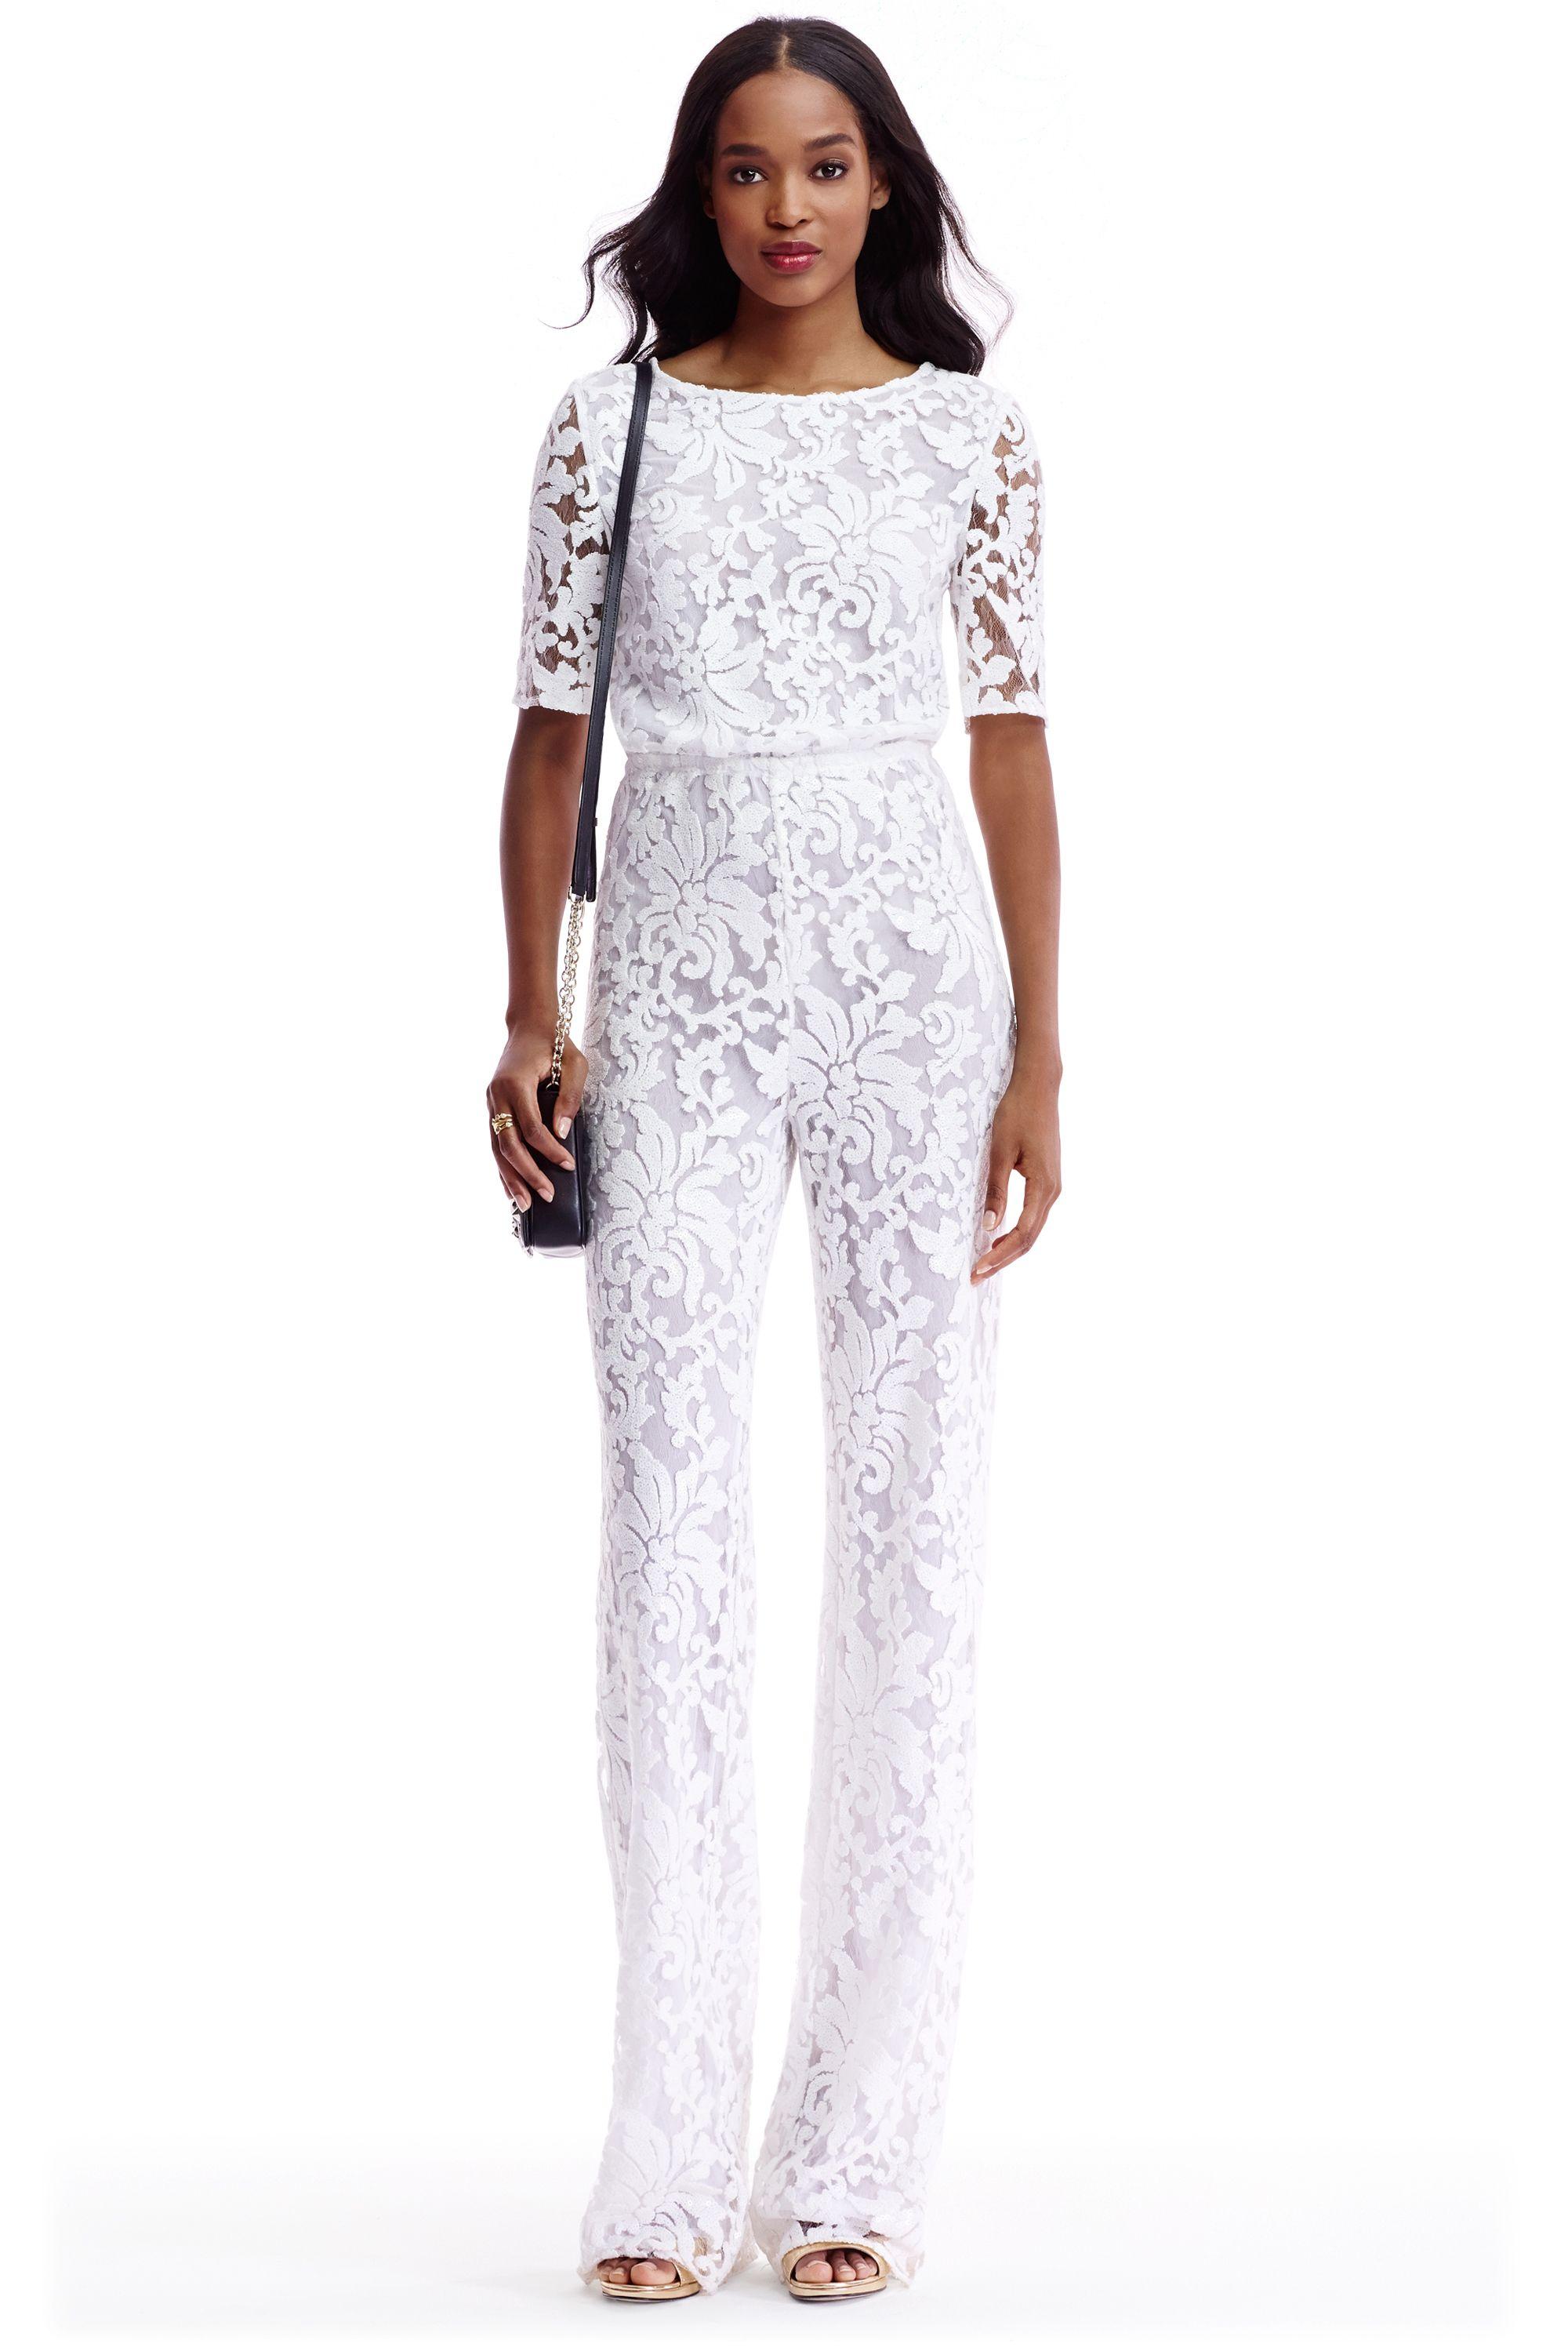 bd22f954f7f4 DVF Kendra Embellished Open Back Jumpsuit in white